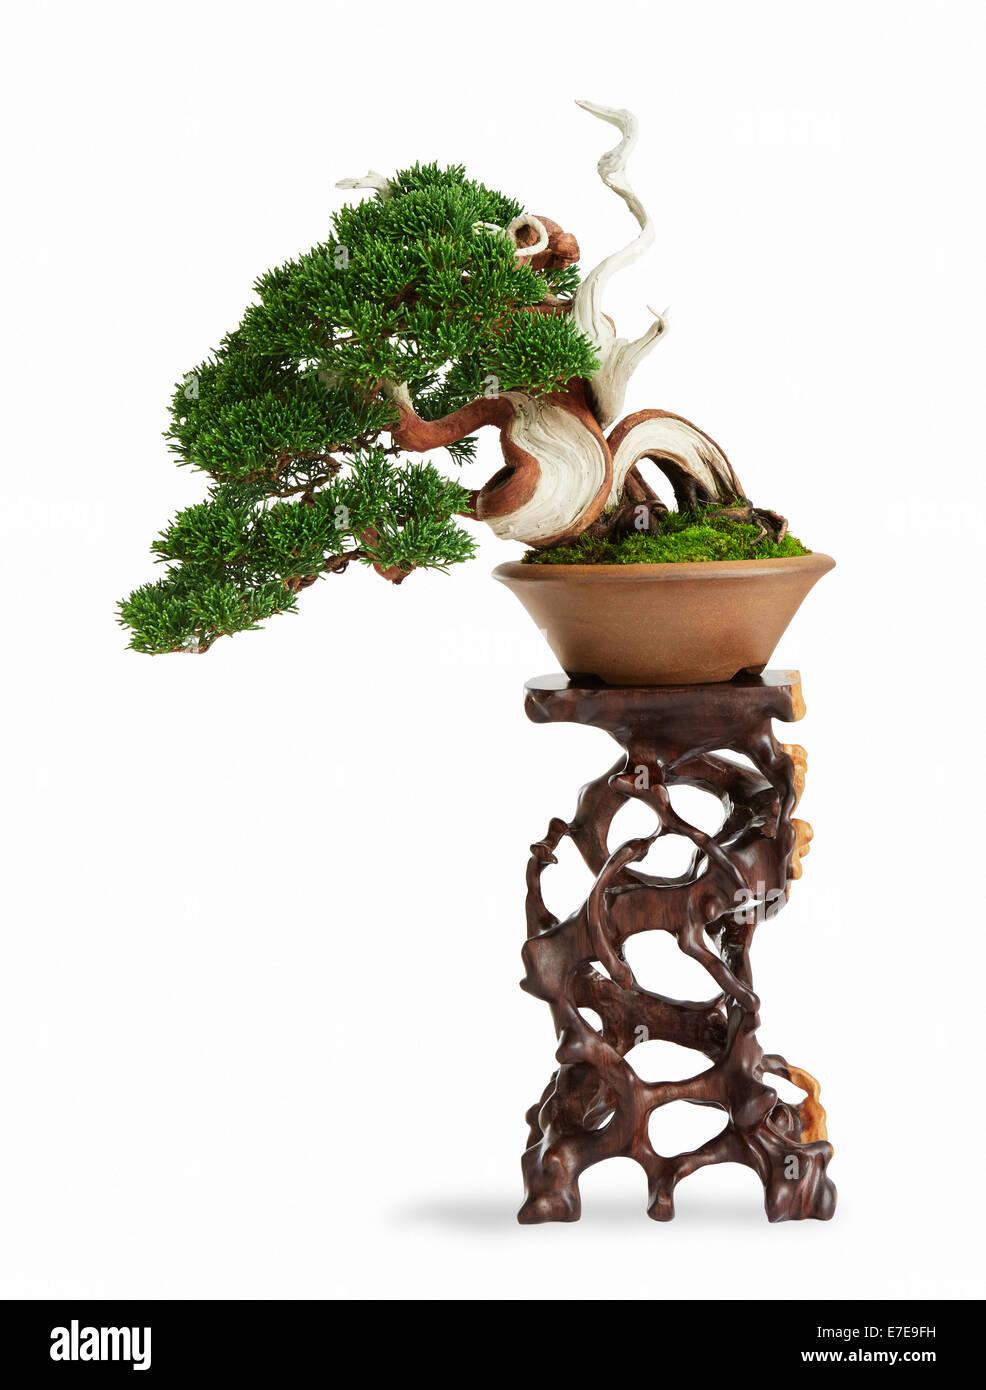 Bonsai Juniperus Chinensis (Chinese Juniper) - Stock Image